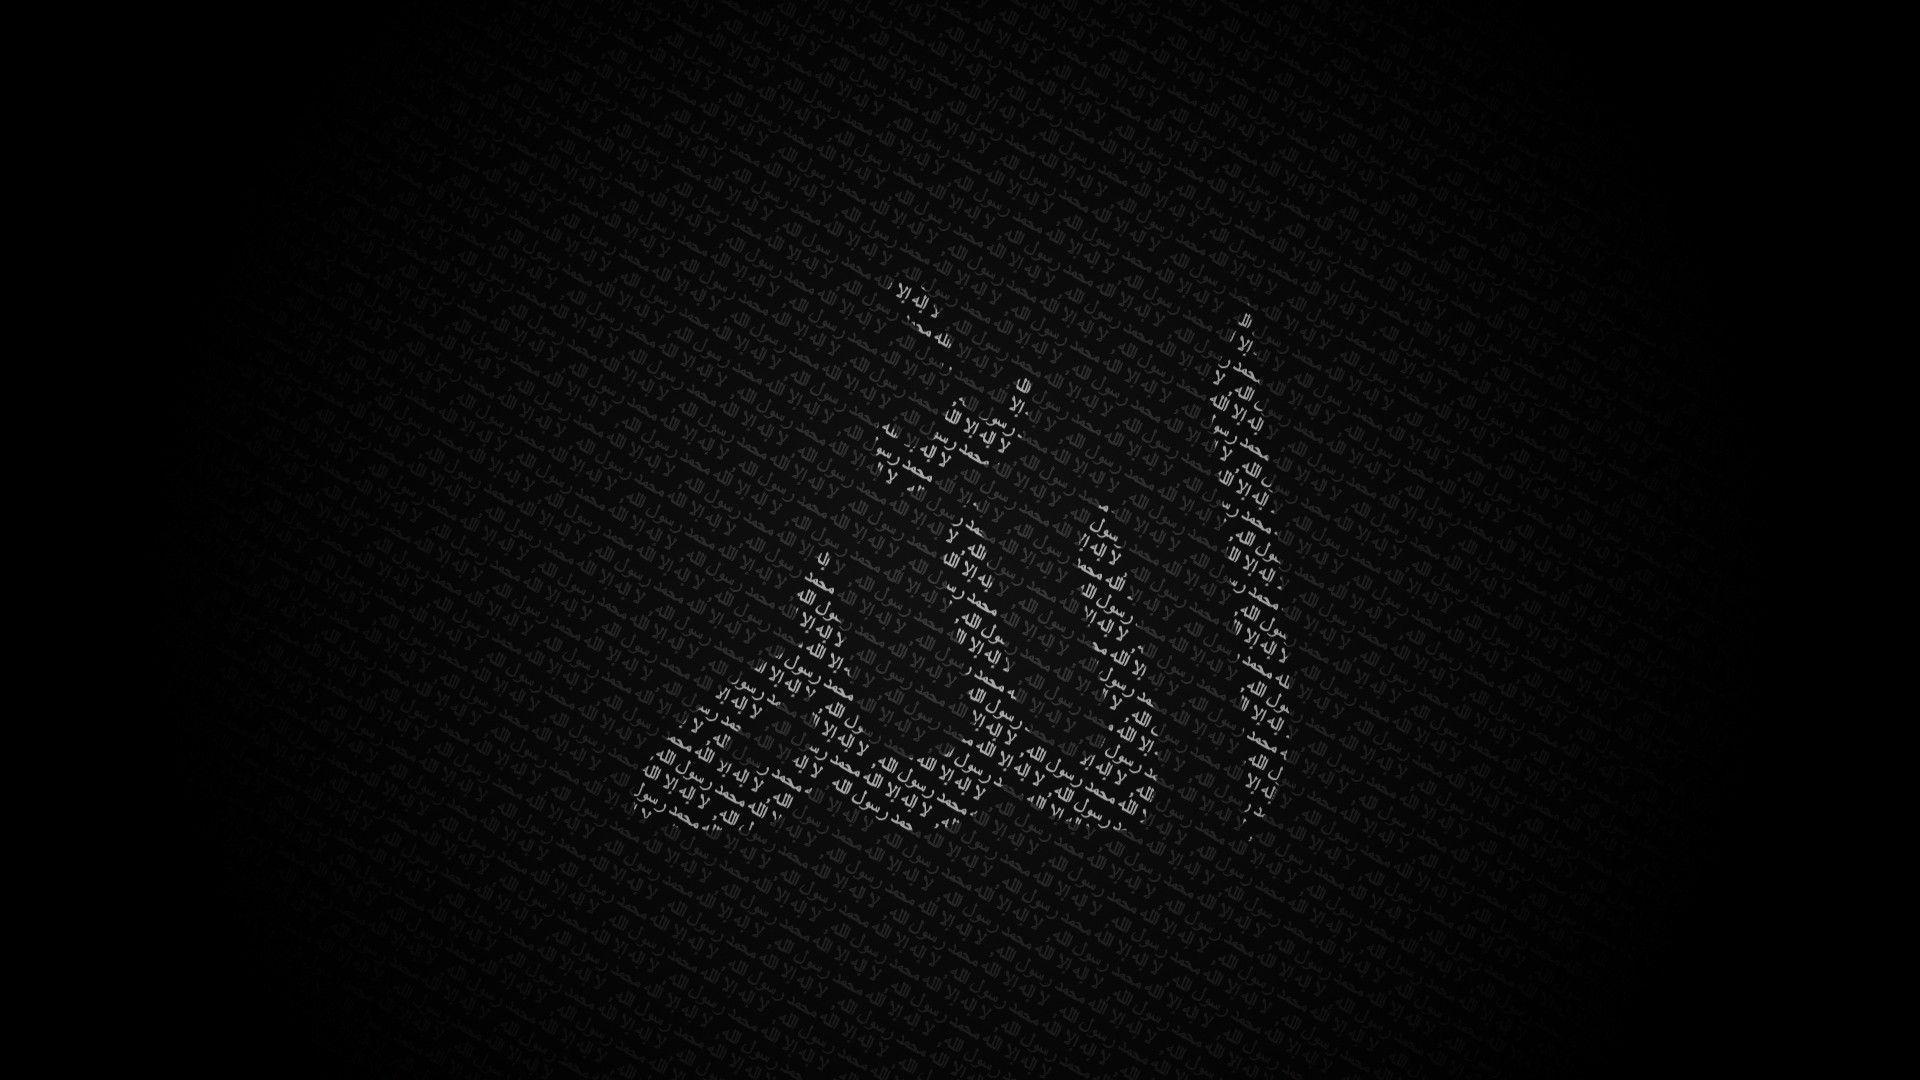 Black Muslim Wallpapers Top Free Black Muslim Backgrounds Wallpaperaccess